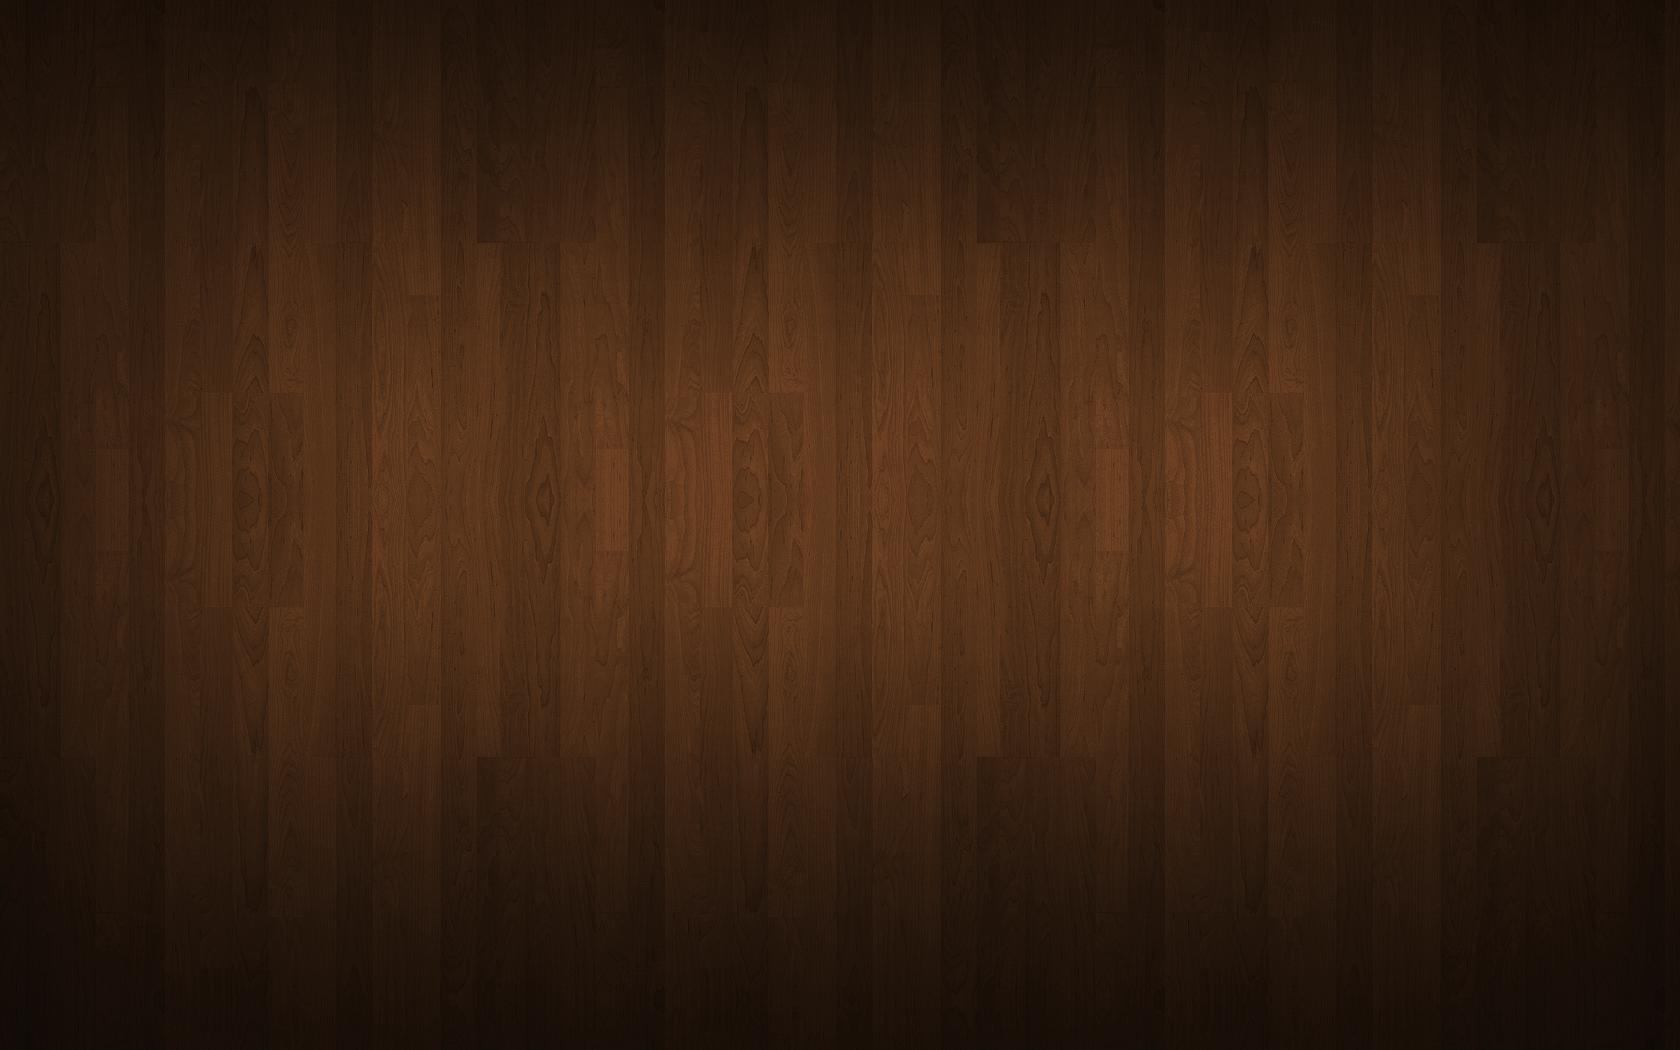 Brown Wallpaper HD Background 1680x1050